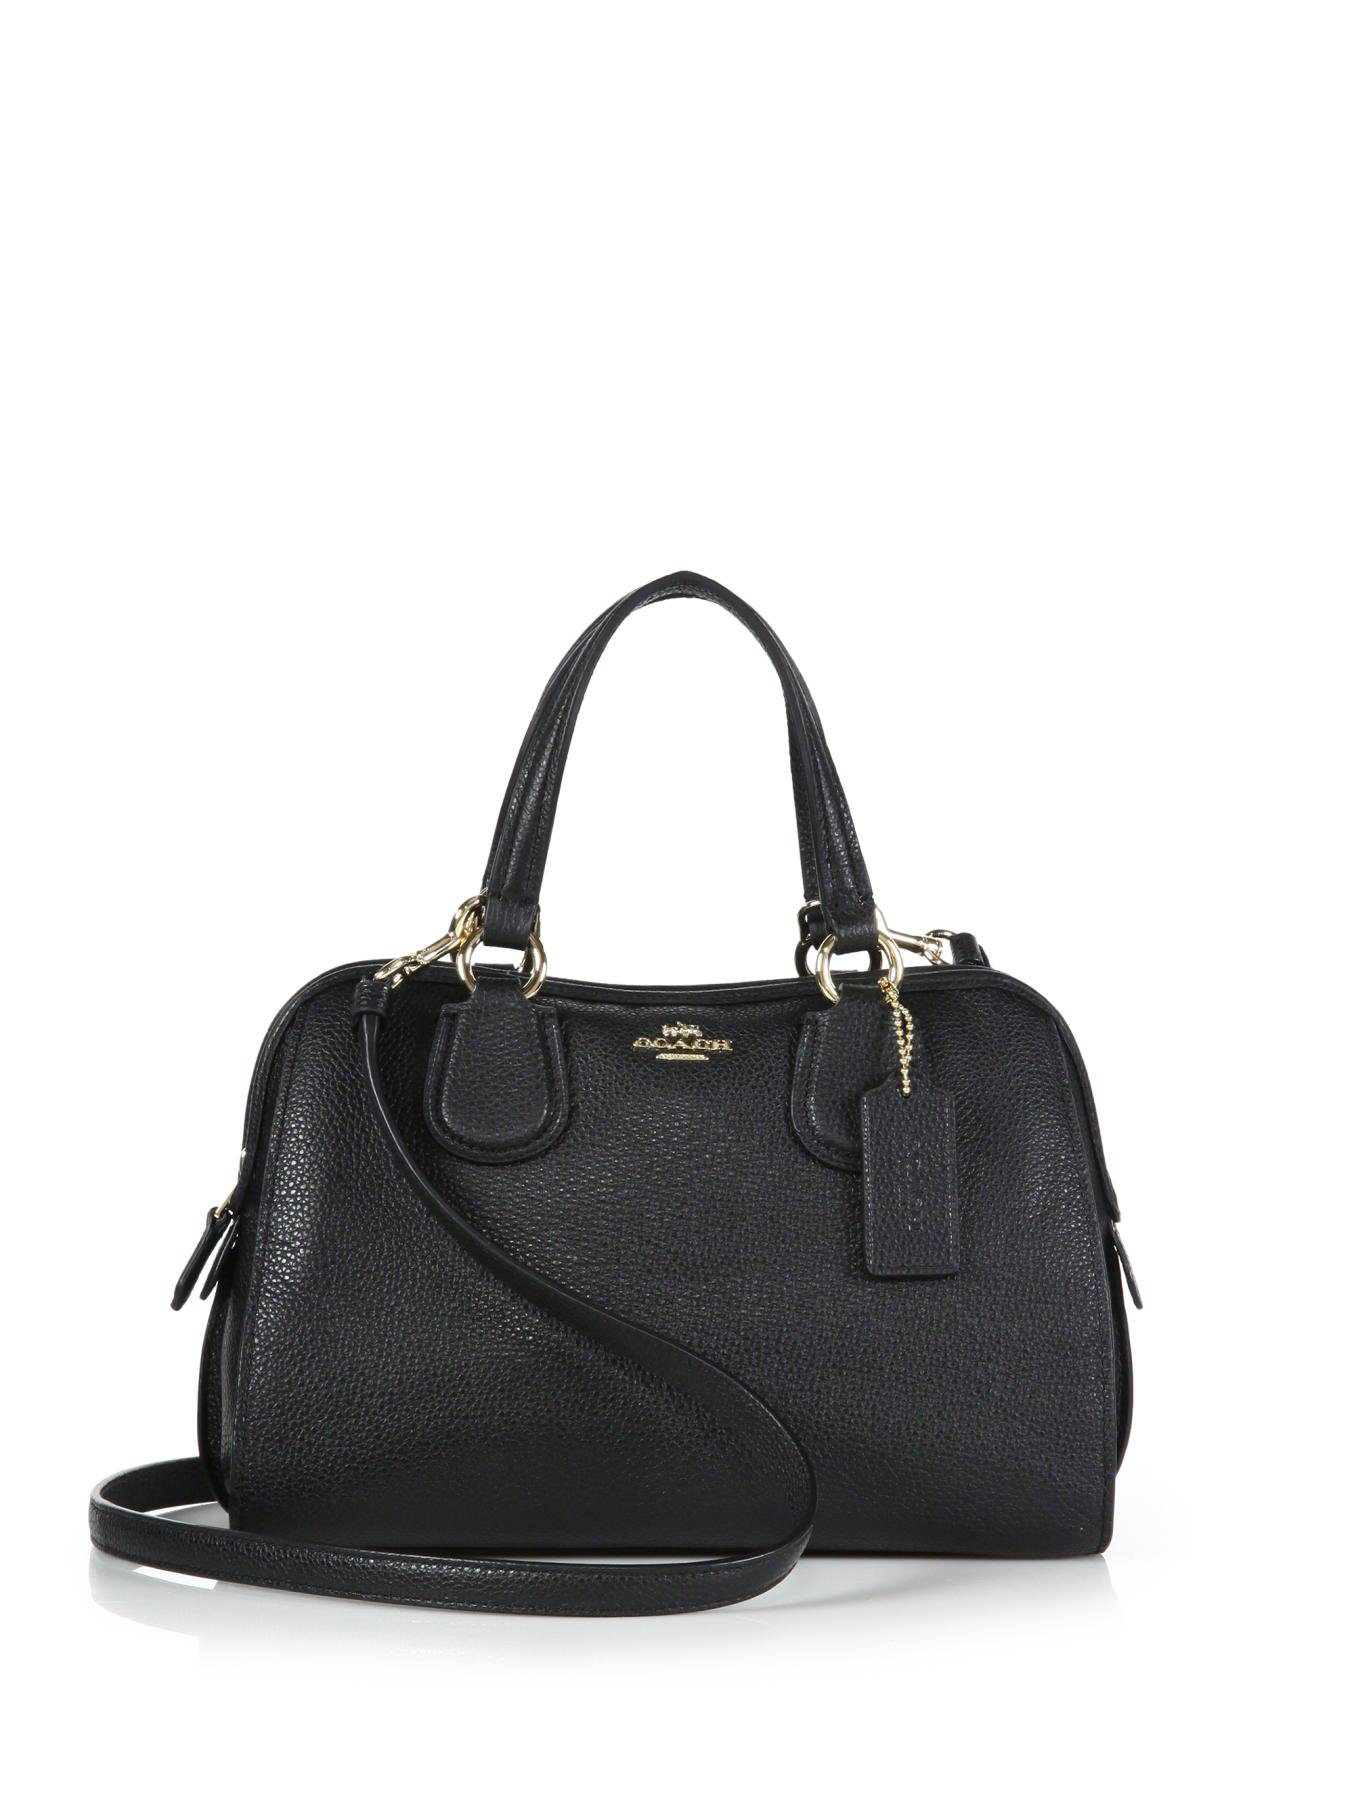 f012e8ad2a ... leather 34370 fdf01 1dc3c official store lyst coach nolita mini satchel  in black 18350 67842 ...